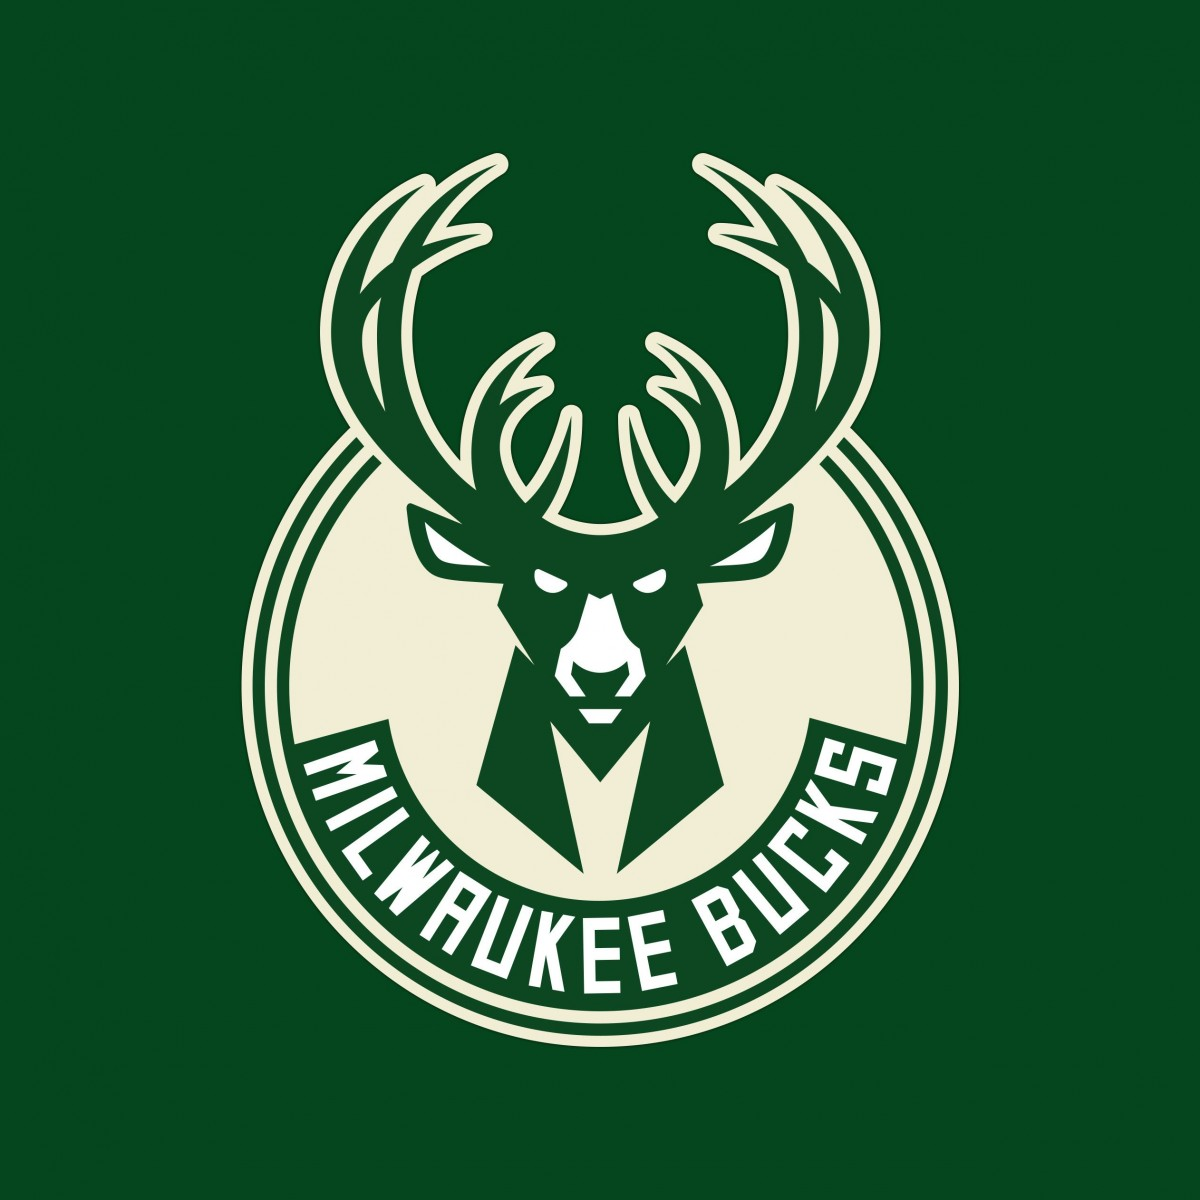 Milwaukee Bucks Clinch Early Playoff Berth